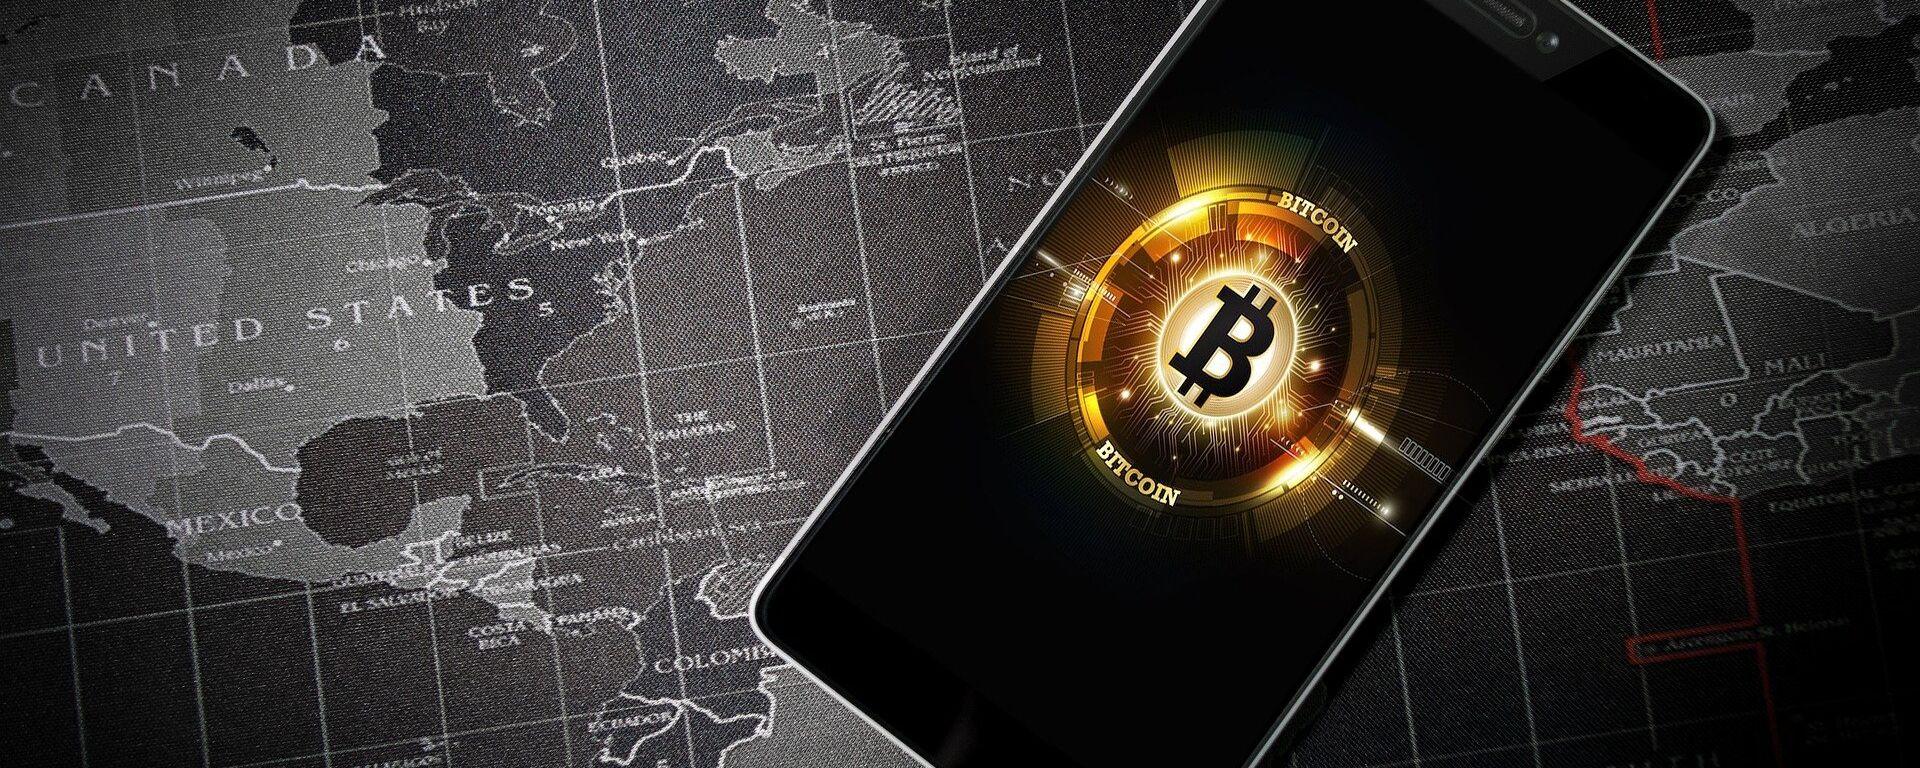 Un móvil con la imagen del logo de bitcoin   - Sputnik Mundo, 1920, 15.01.2021